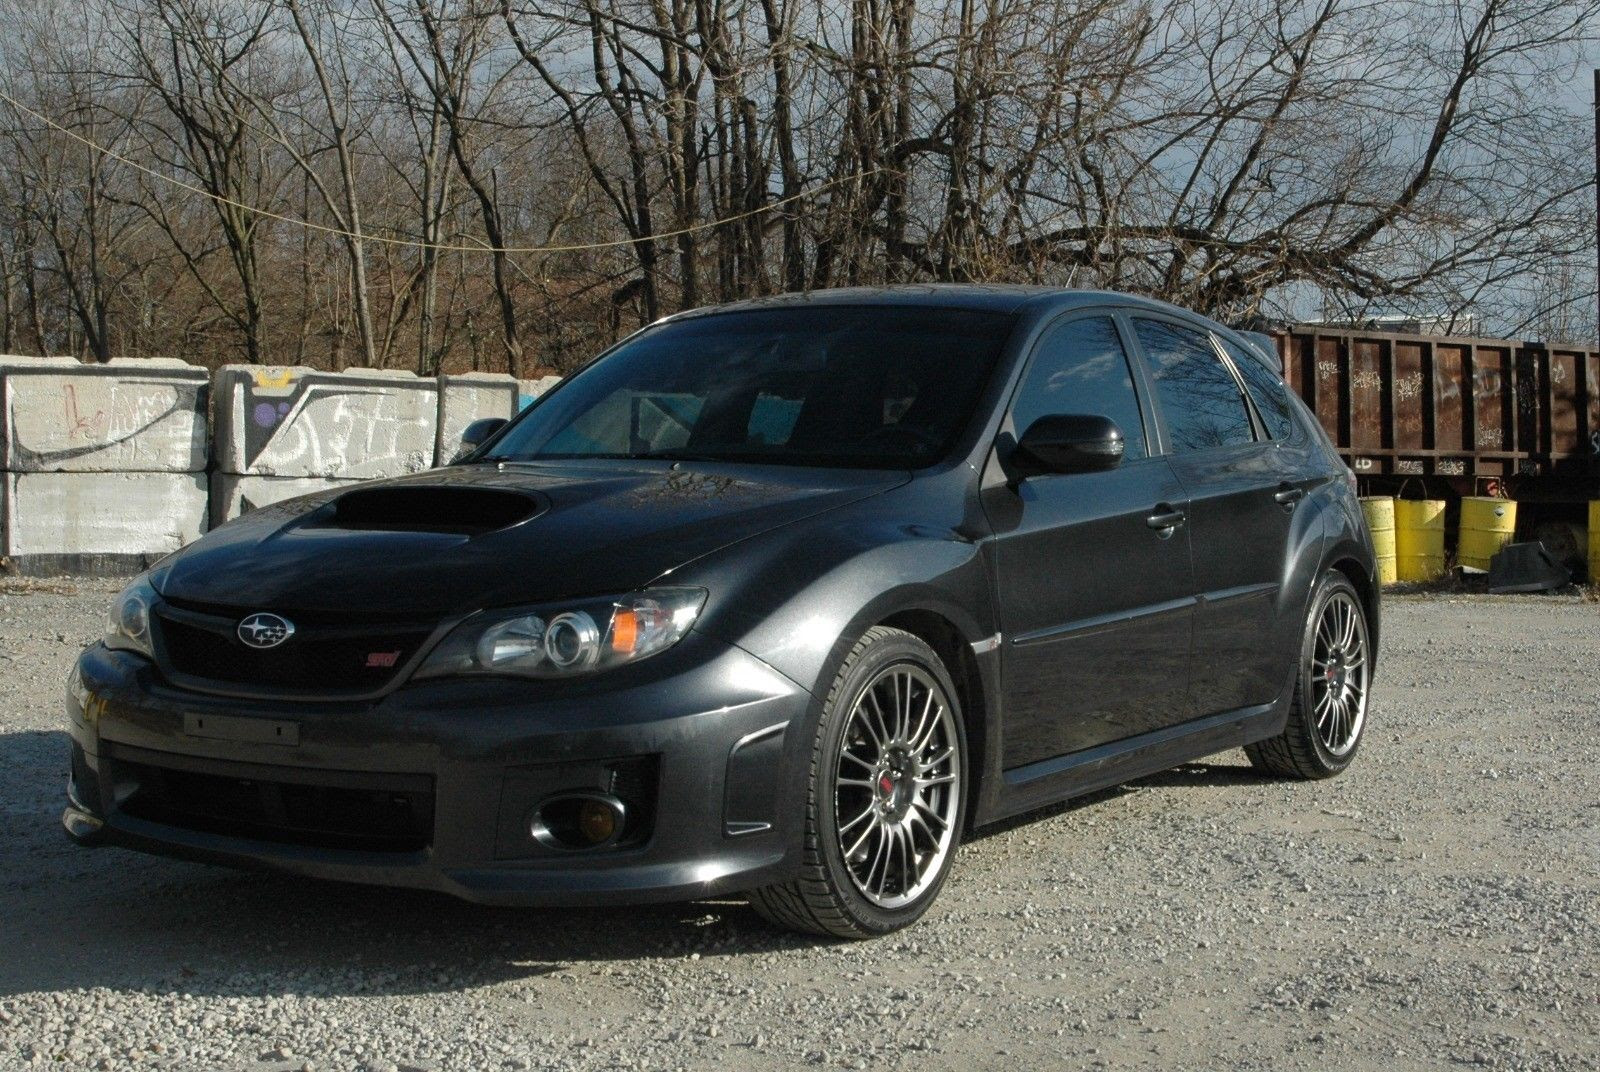 Subaru Wrx Sti Hatchback Supercars Gallery